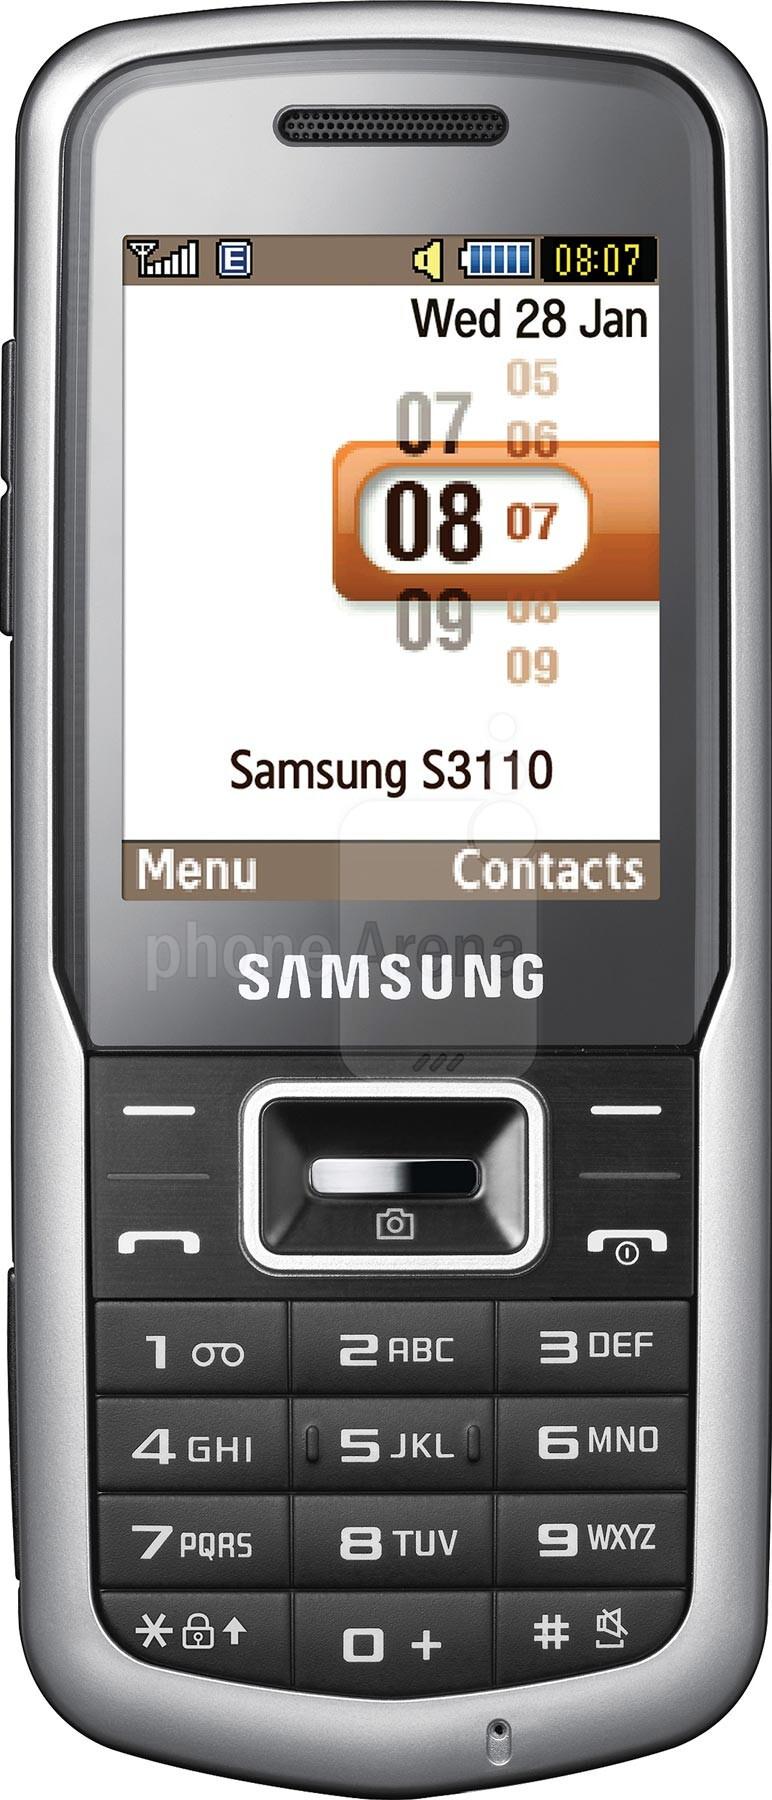 Samsung S3110L